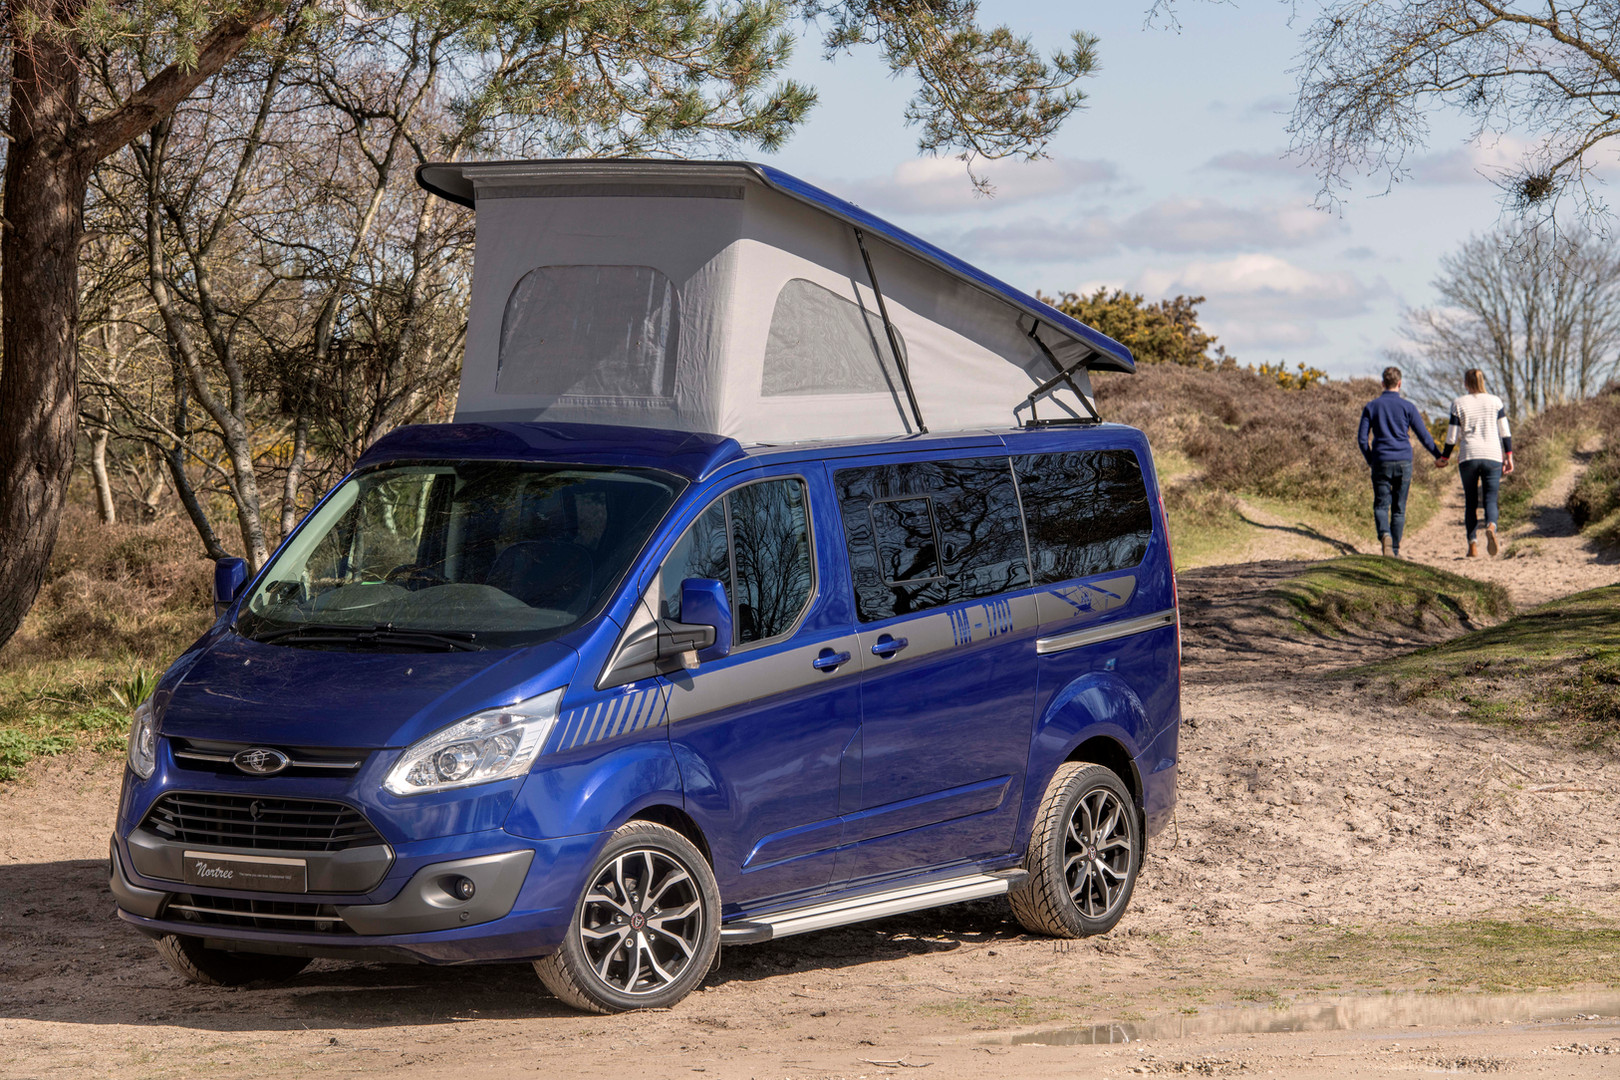 Ad picture for a bespoke campervan manufacturer